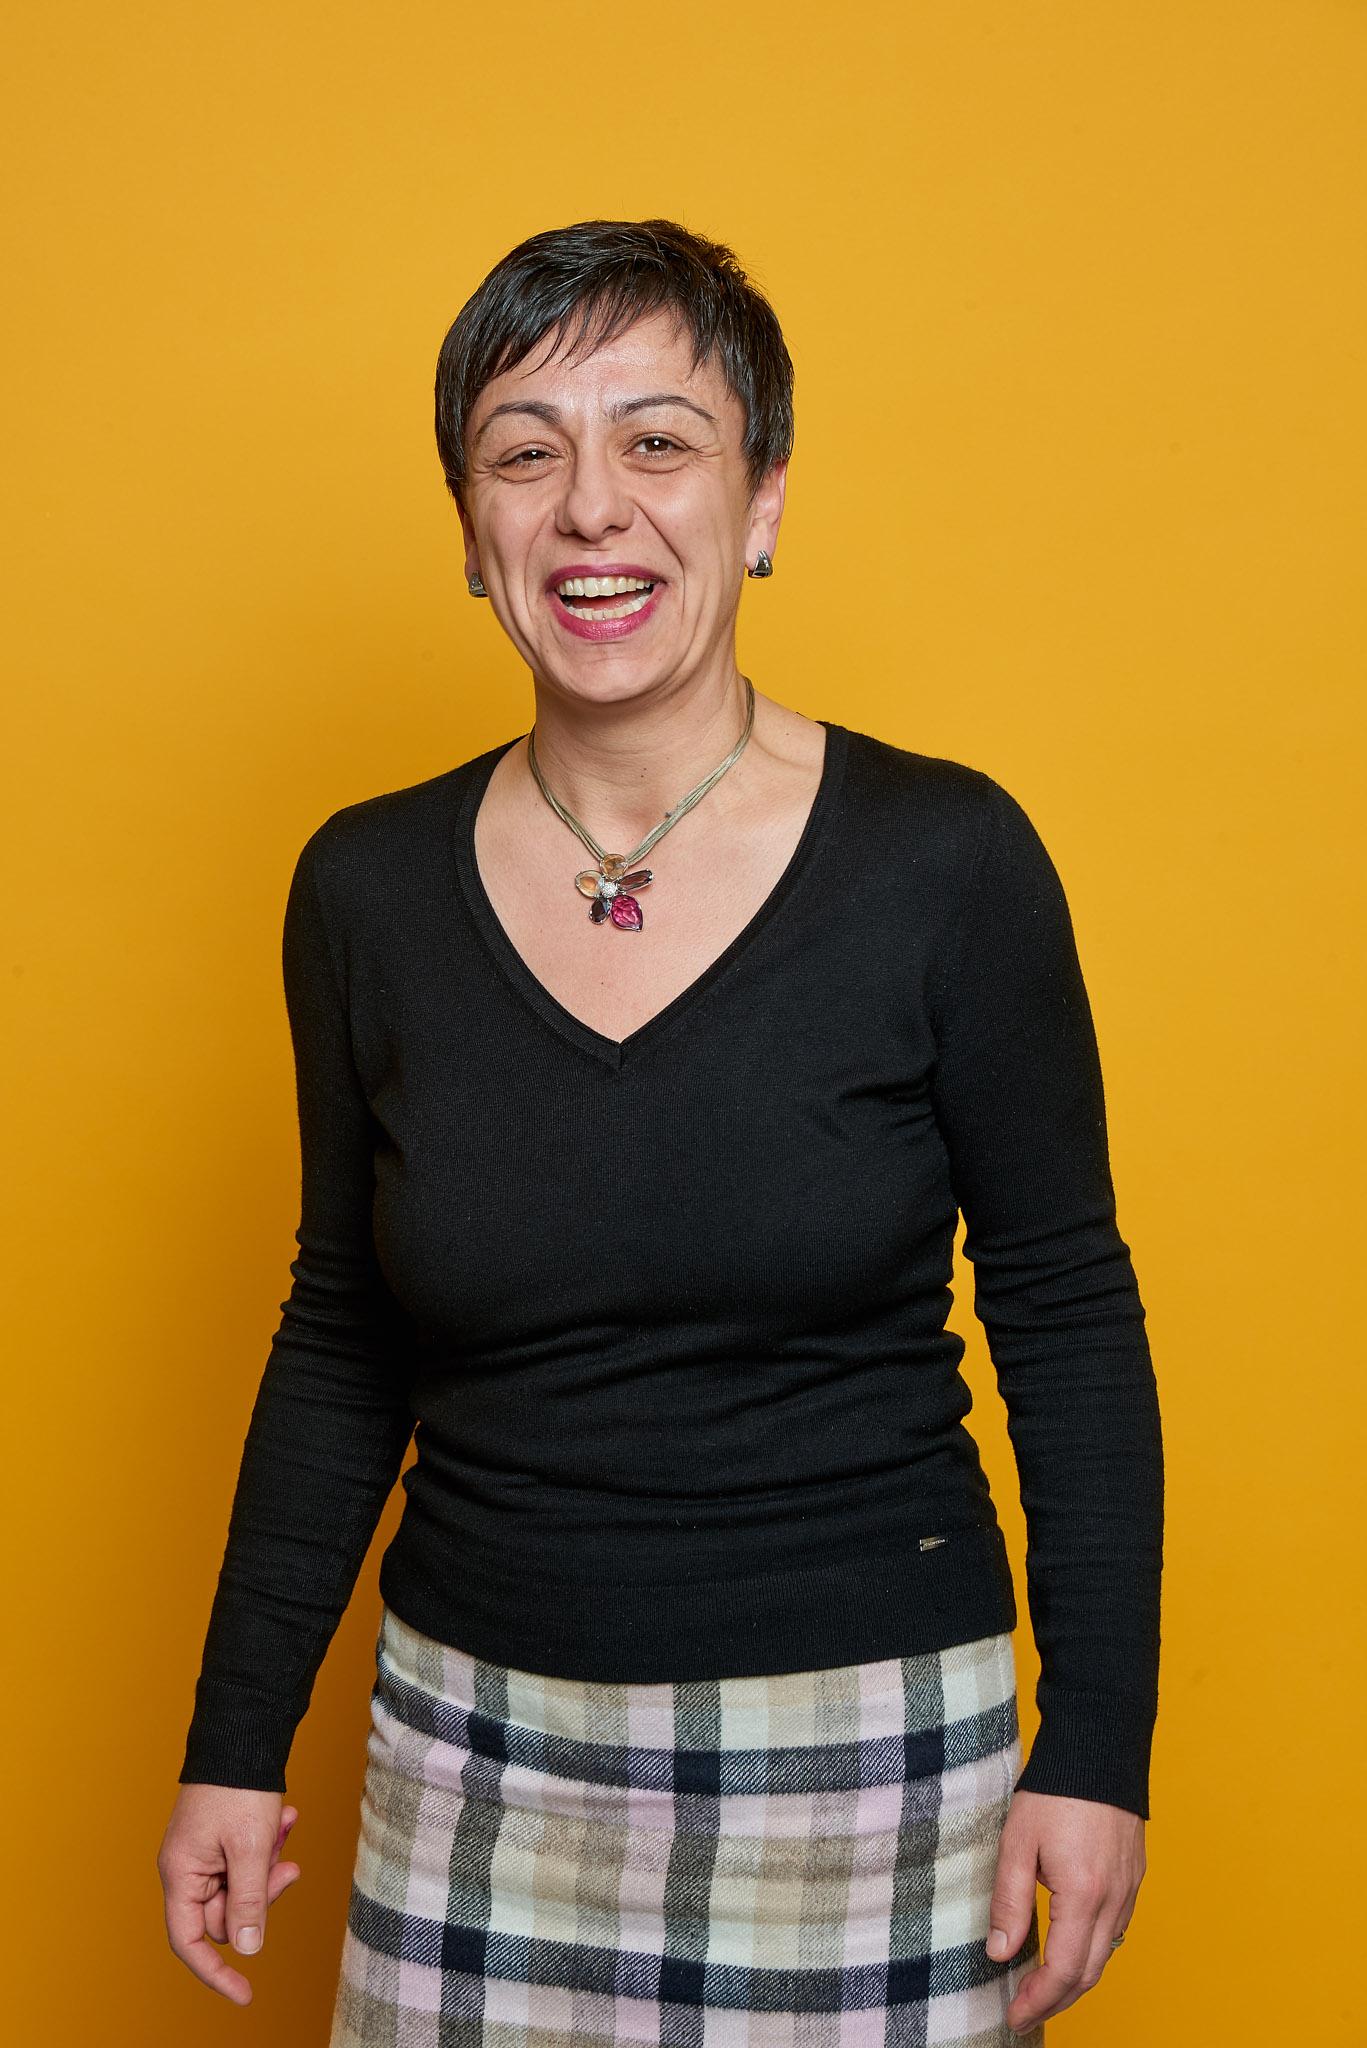 Mag. Iordanka Kretzschmar